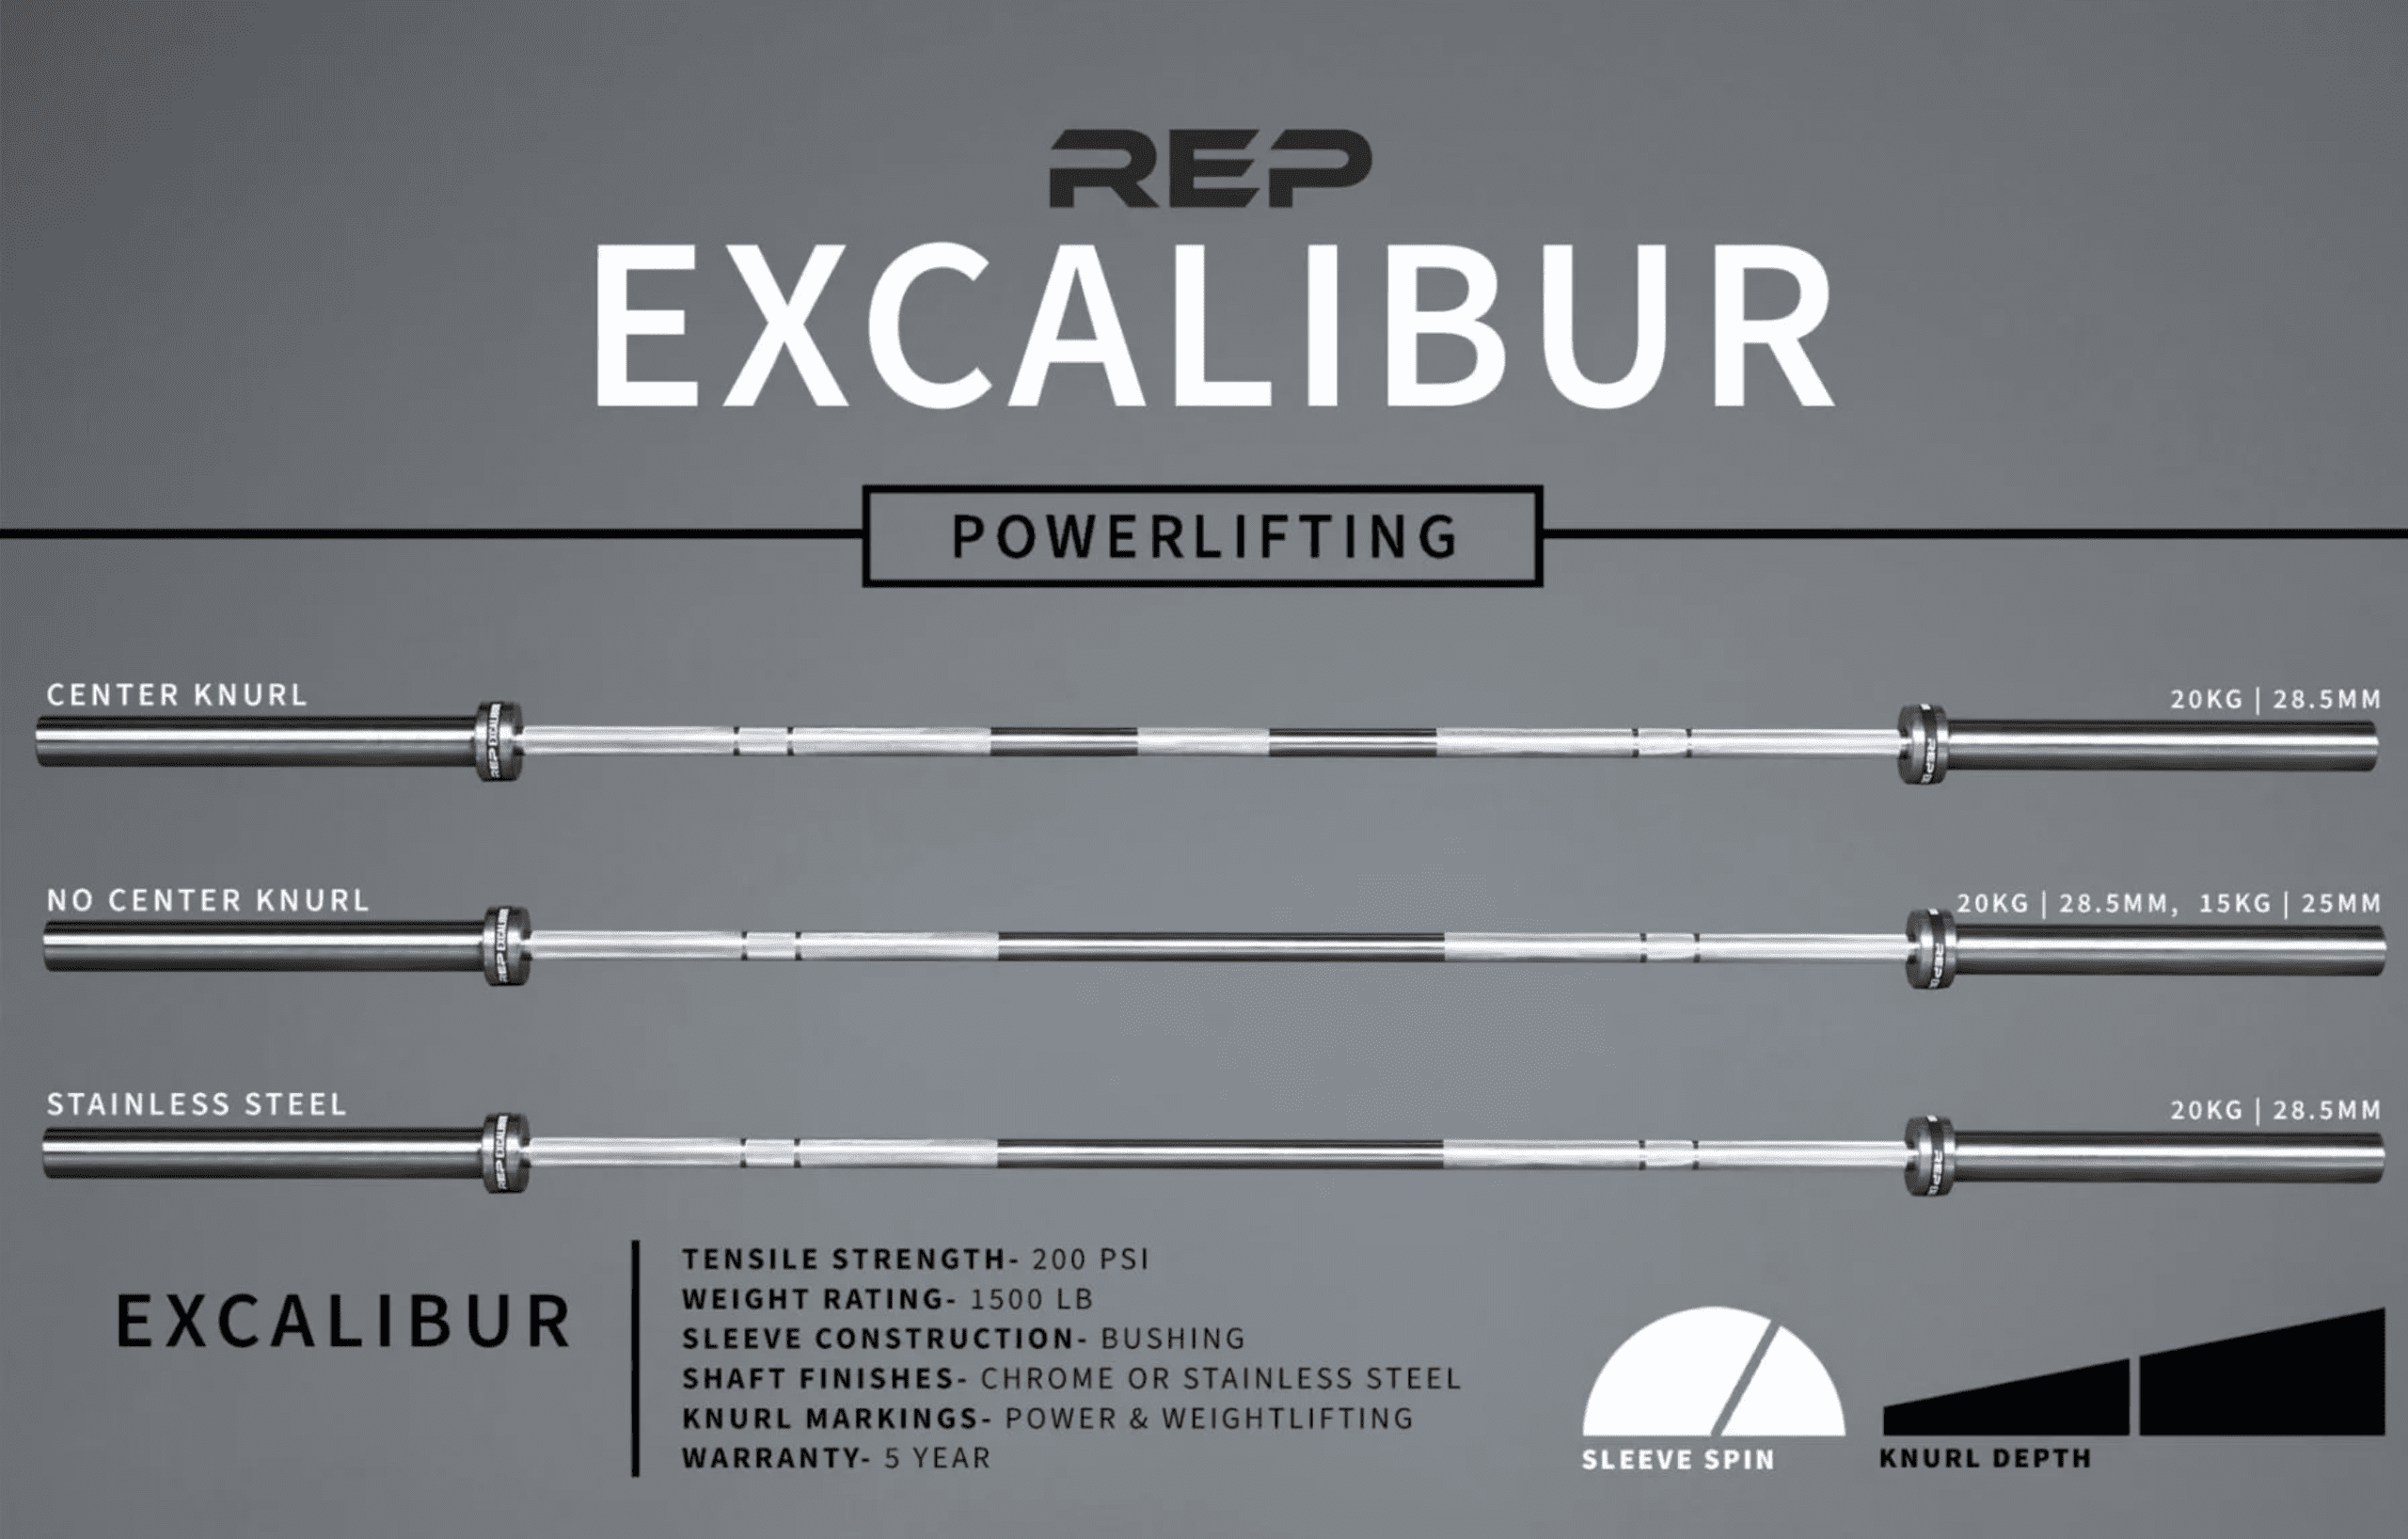 REP Excalibur Bar